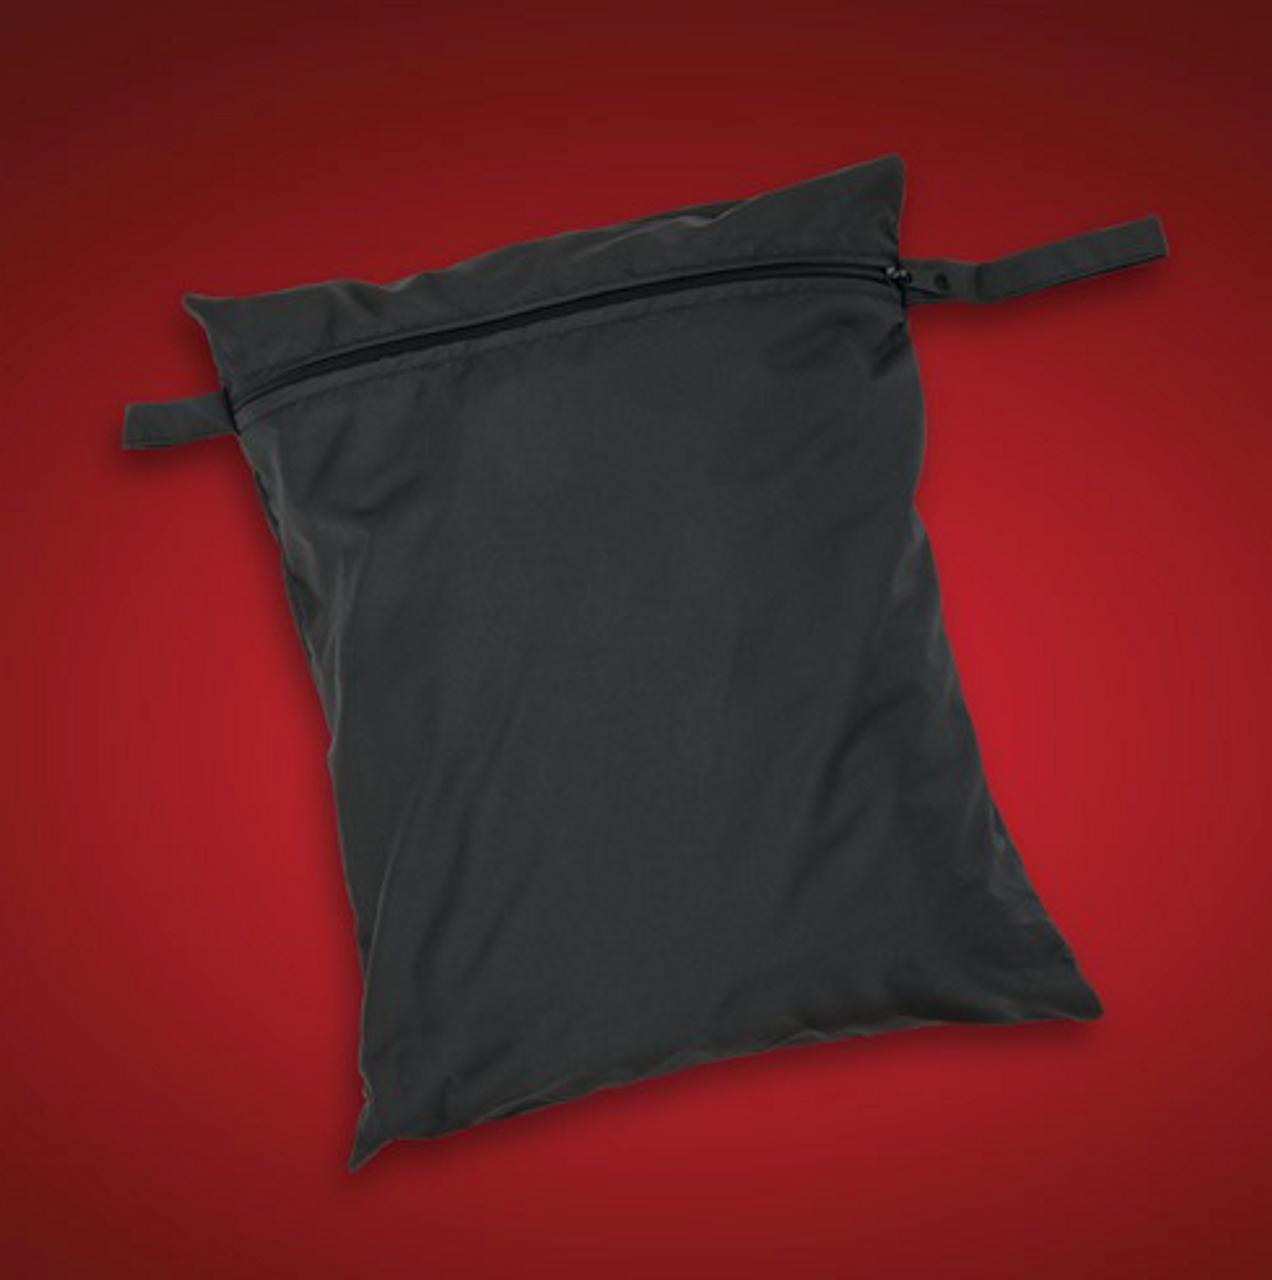 Ryker - Full Cover Black Charcoal